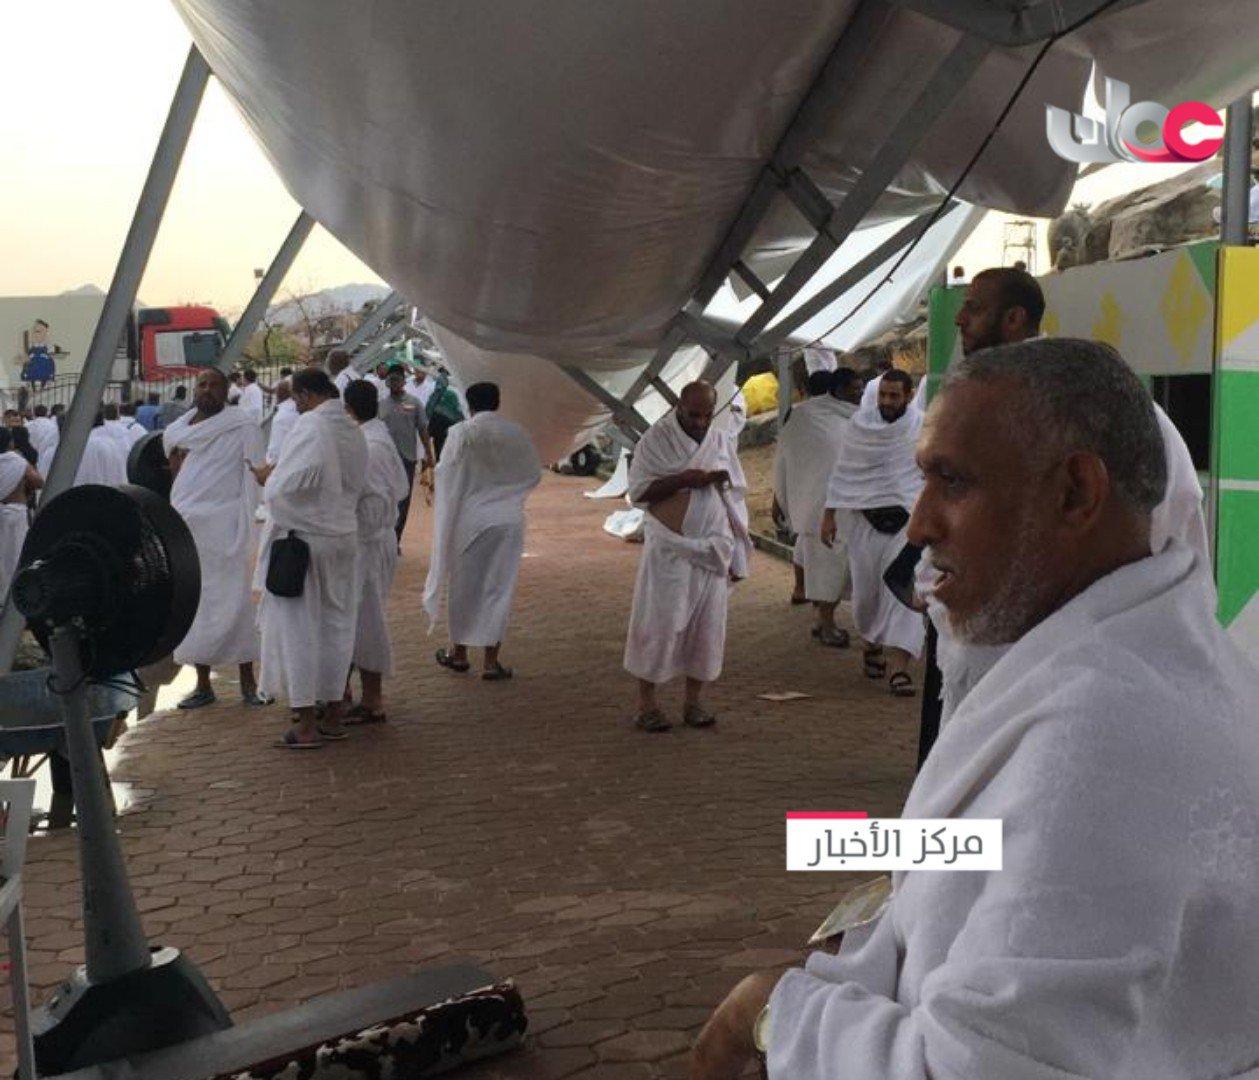 Oman's Haj pilgrims safe after cover falls